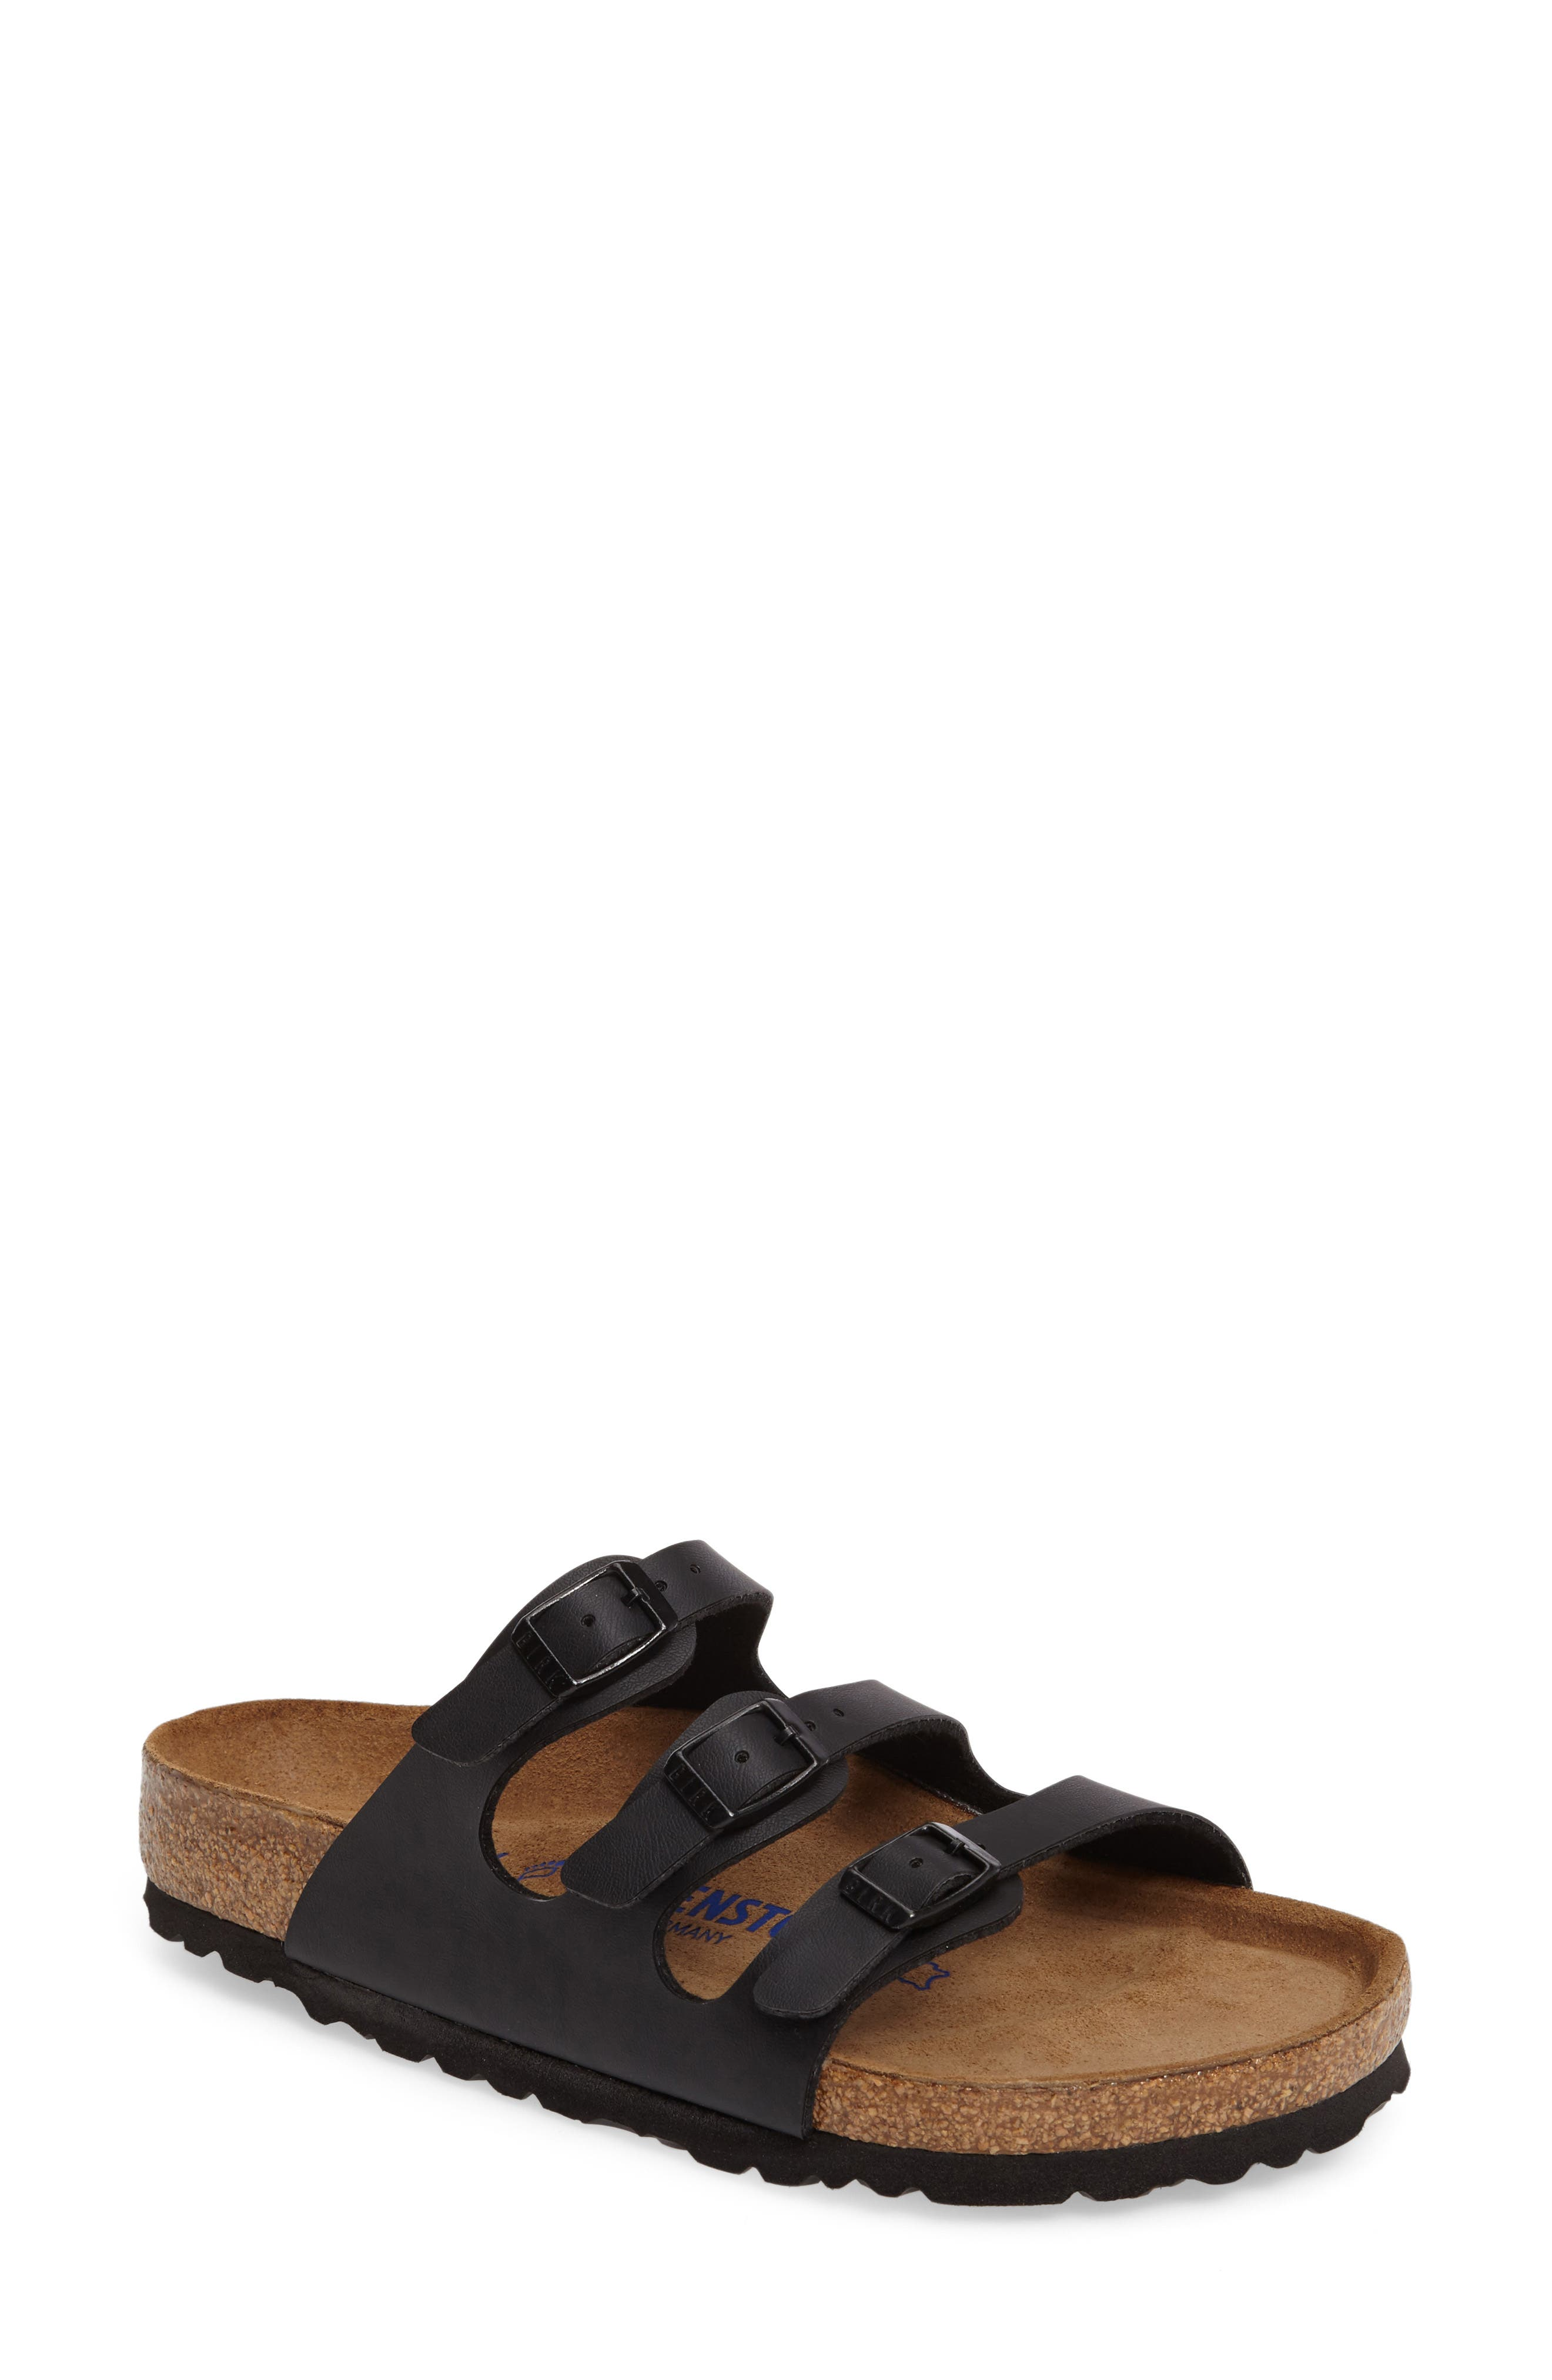 Florida Soft Footbed Slide Sandal,                             Main thumbnail 1, color,                             BLACK